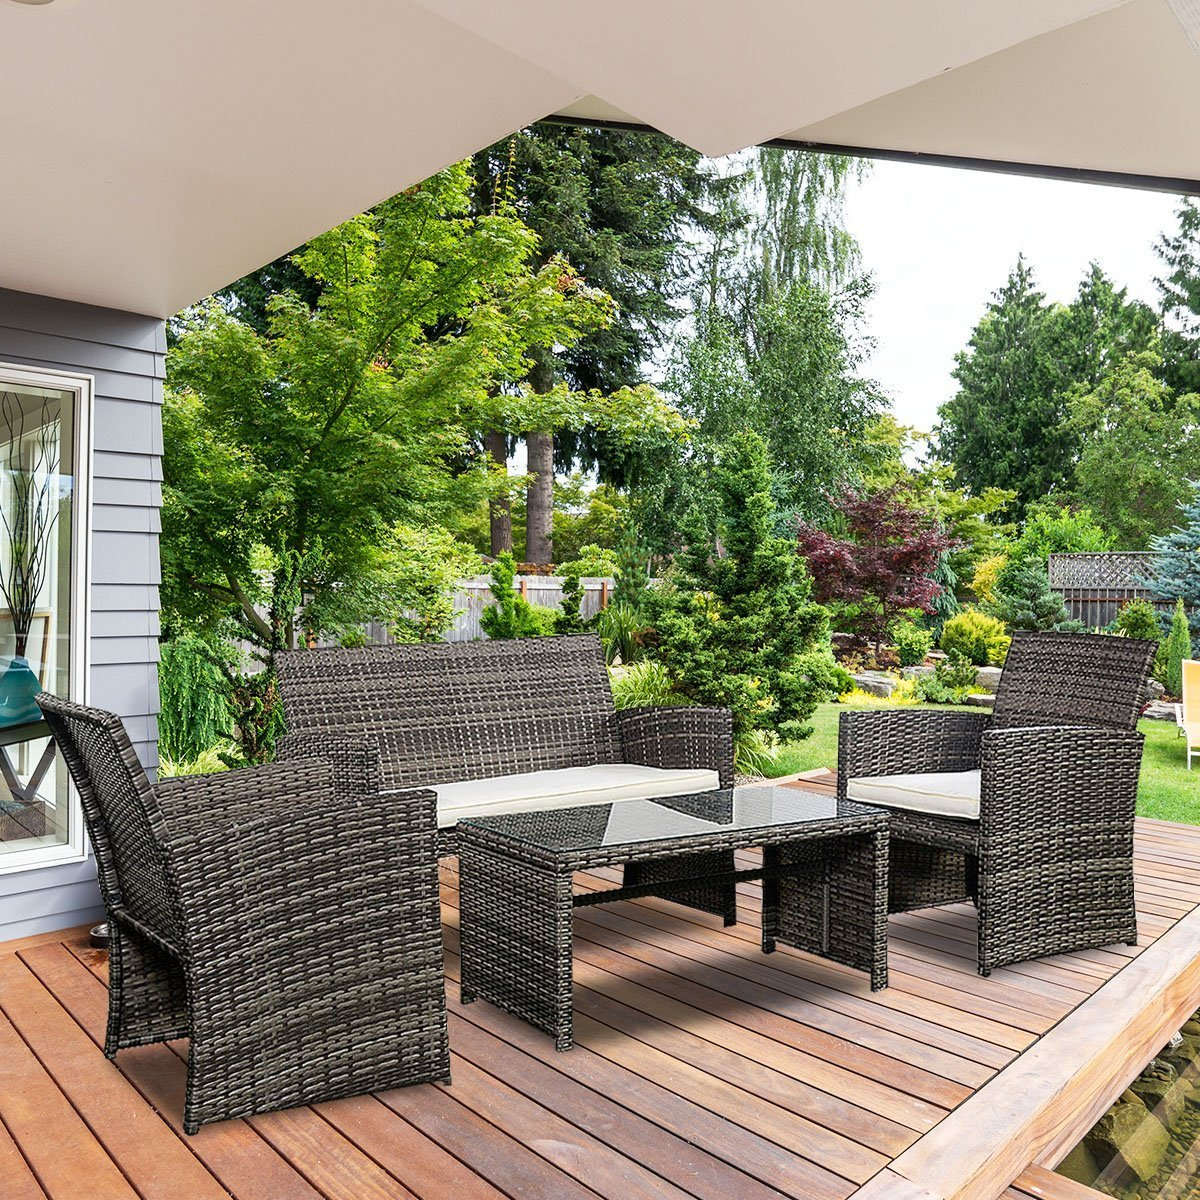 Goplus 4 PC Rattan Patio Furniture Set Garden Lawn Sofa Cushioned Seat Wicker Sofa (Mix Gray) by Goplus (Image #3)